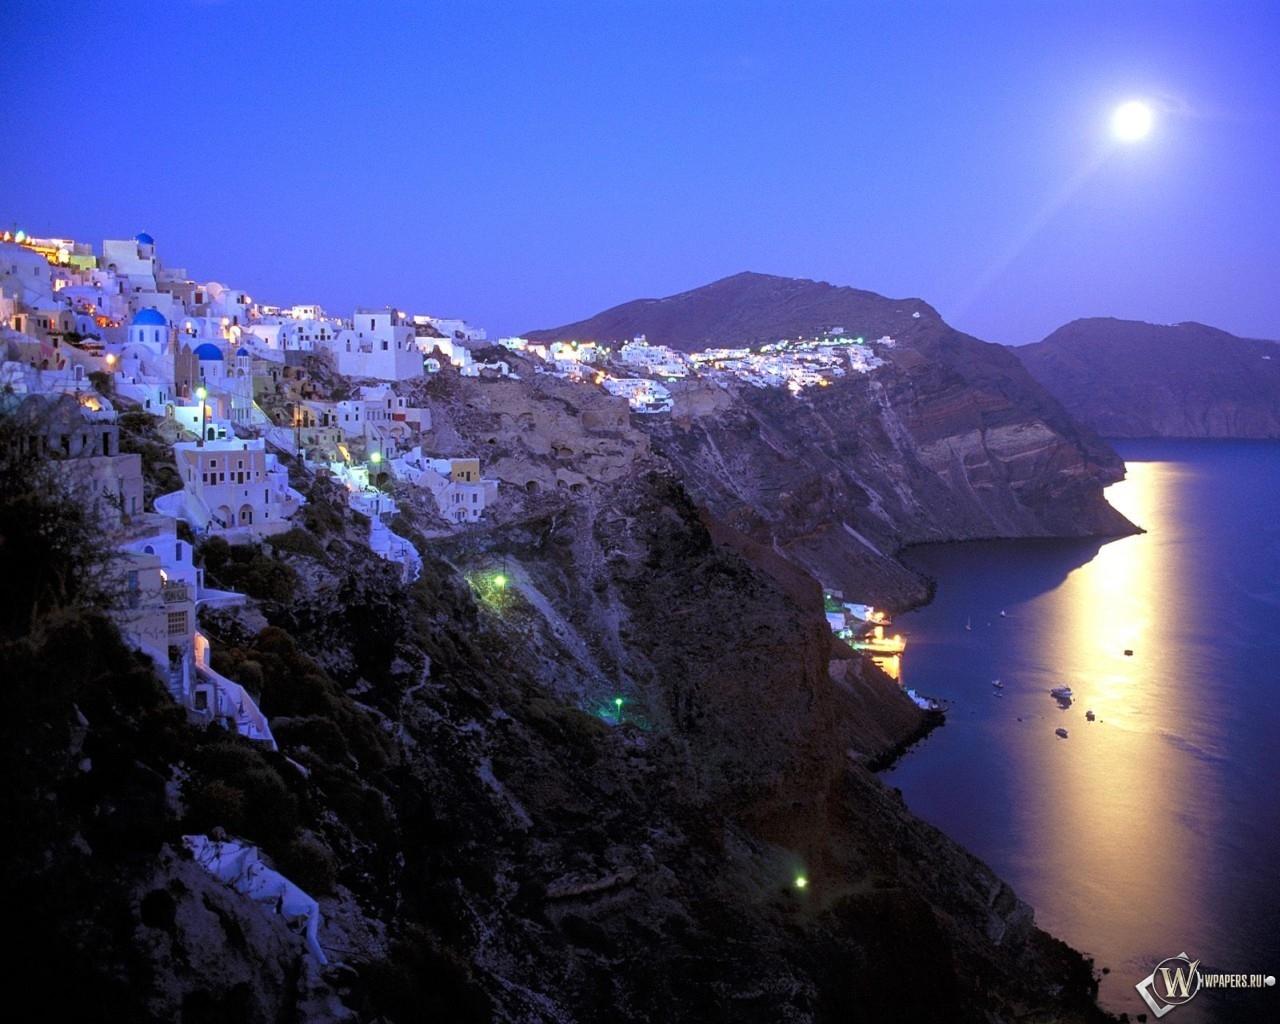 Moonrise Over Santorini - Greece 1280x1024